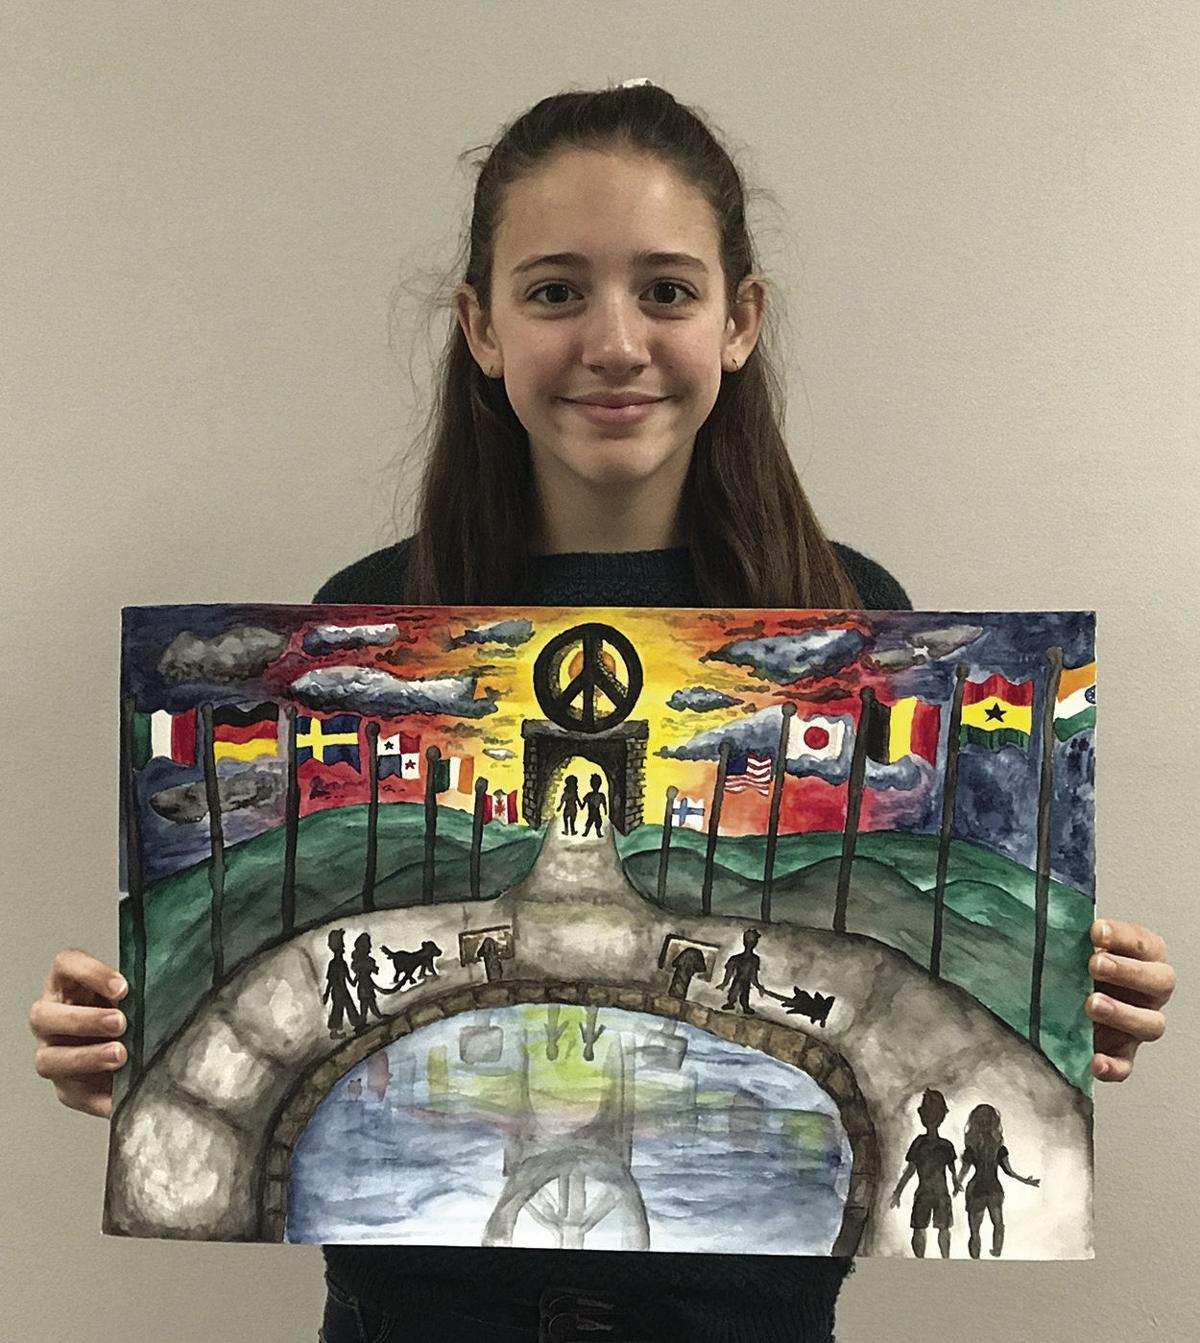 2019 Lions Club International Peace Poster contest winner